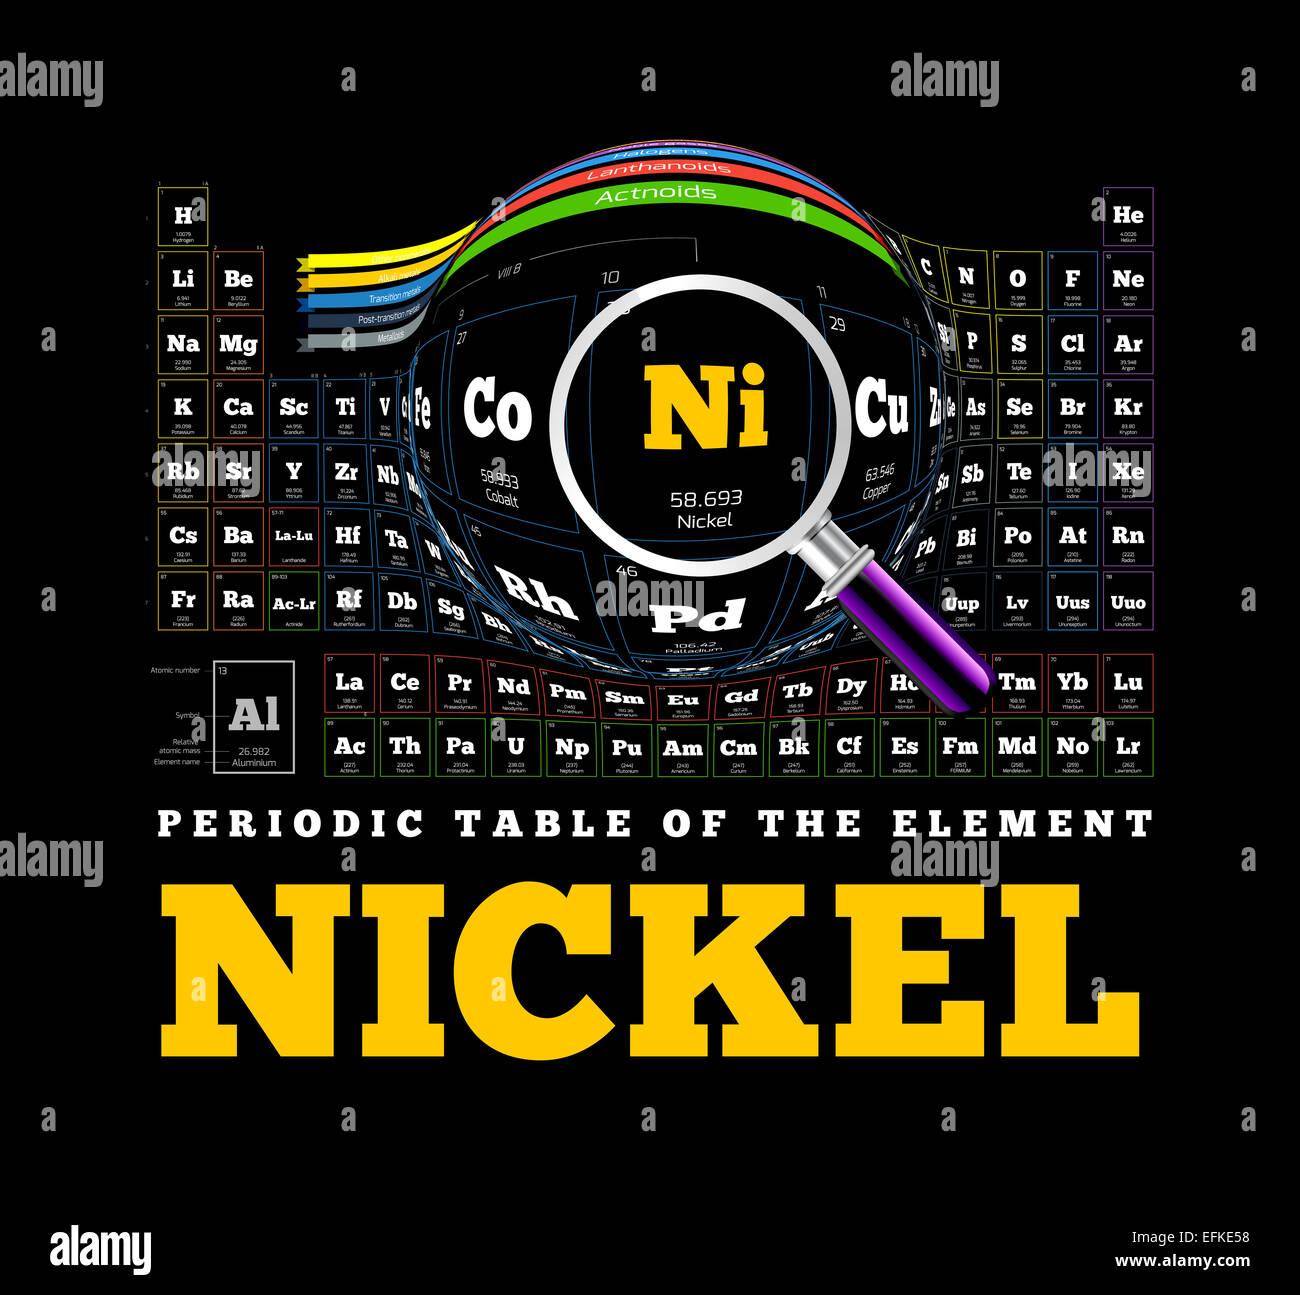 Periodische Tabelle des Elements. Nickel, Ni Stockfoto, Bild ...